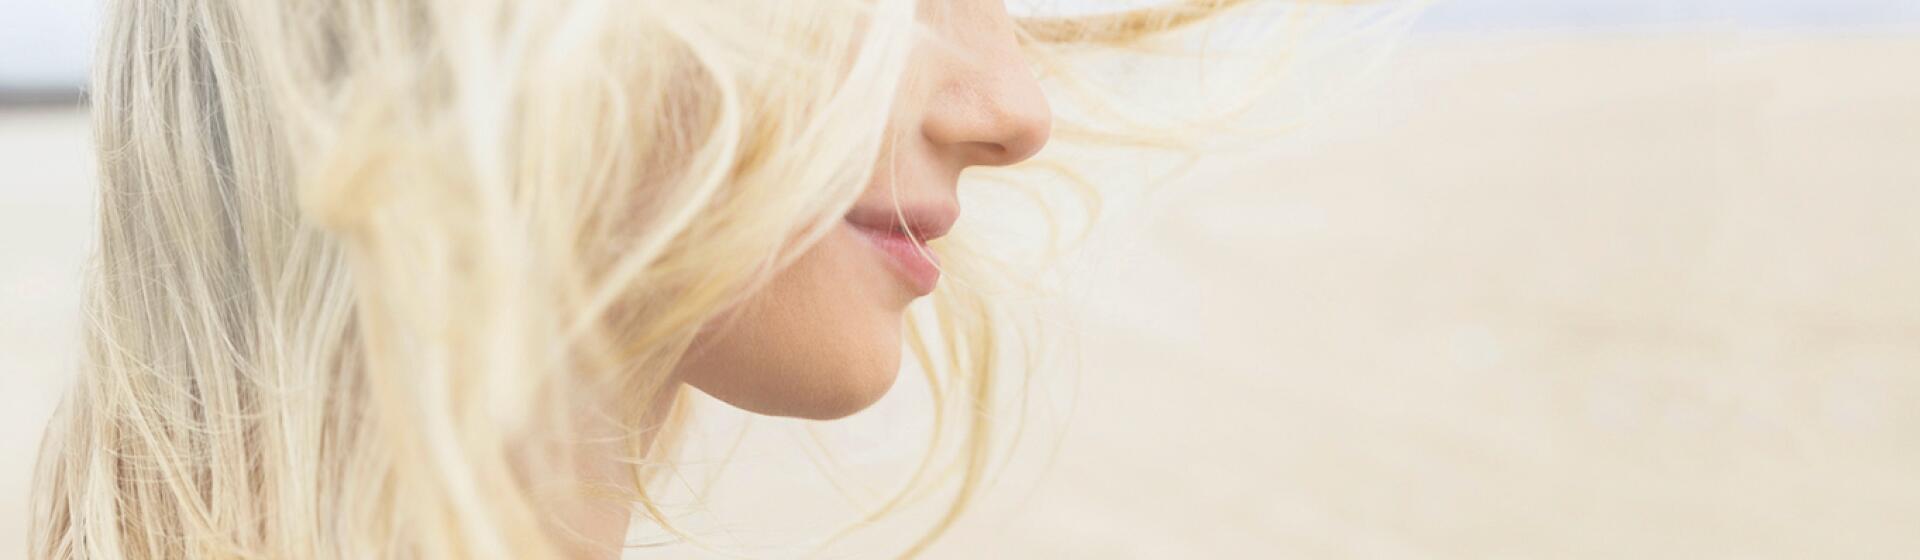 RF_Expert-dossier_Dry-hair_Blond-hair-Woman_Copyright-free (5)